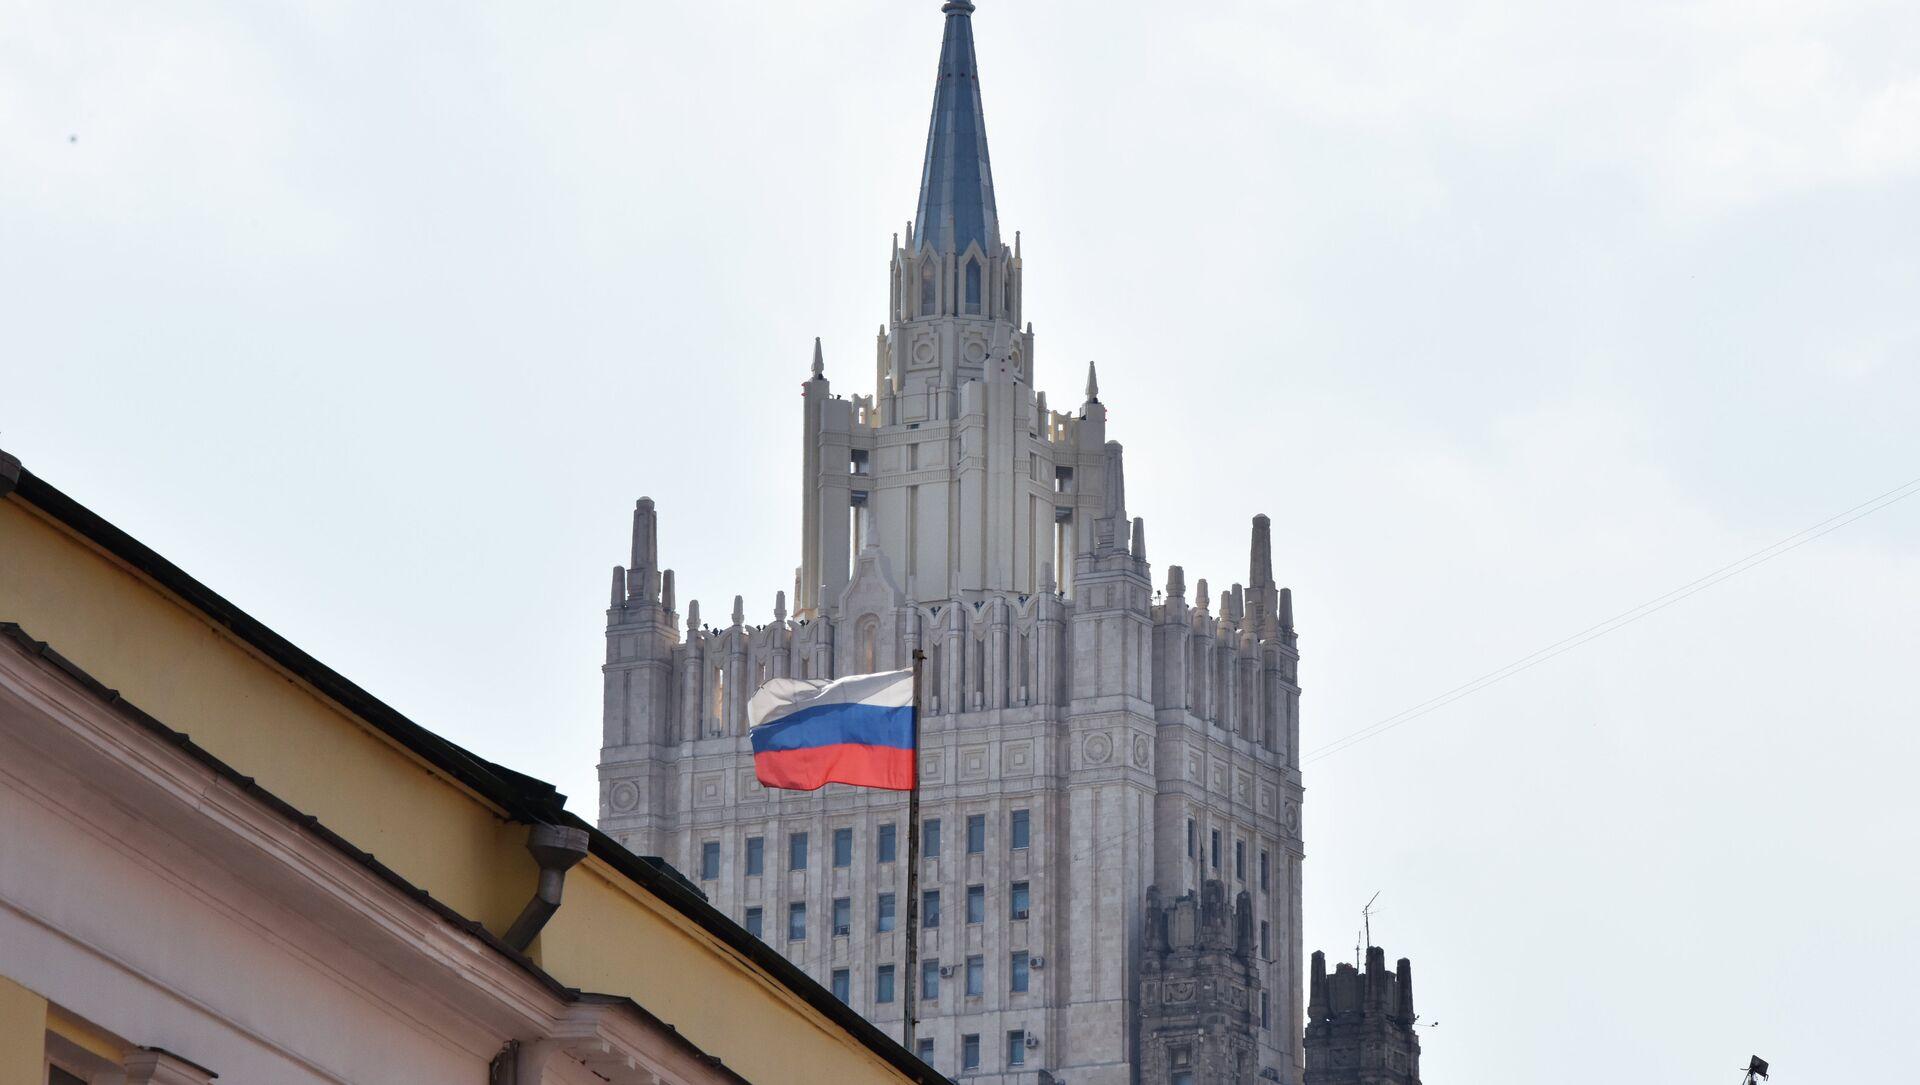 El Ministerio de Asuntos Exteriores ruso en Moscú - Sputnik Mundo, 1920, 08.02.2021